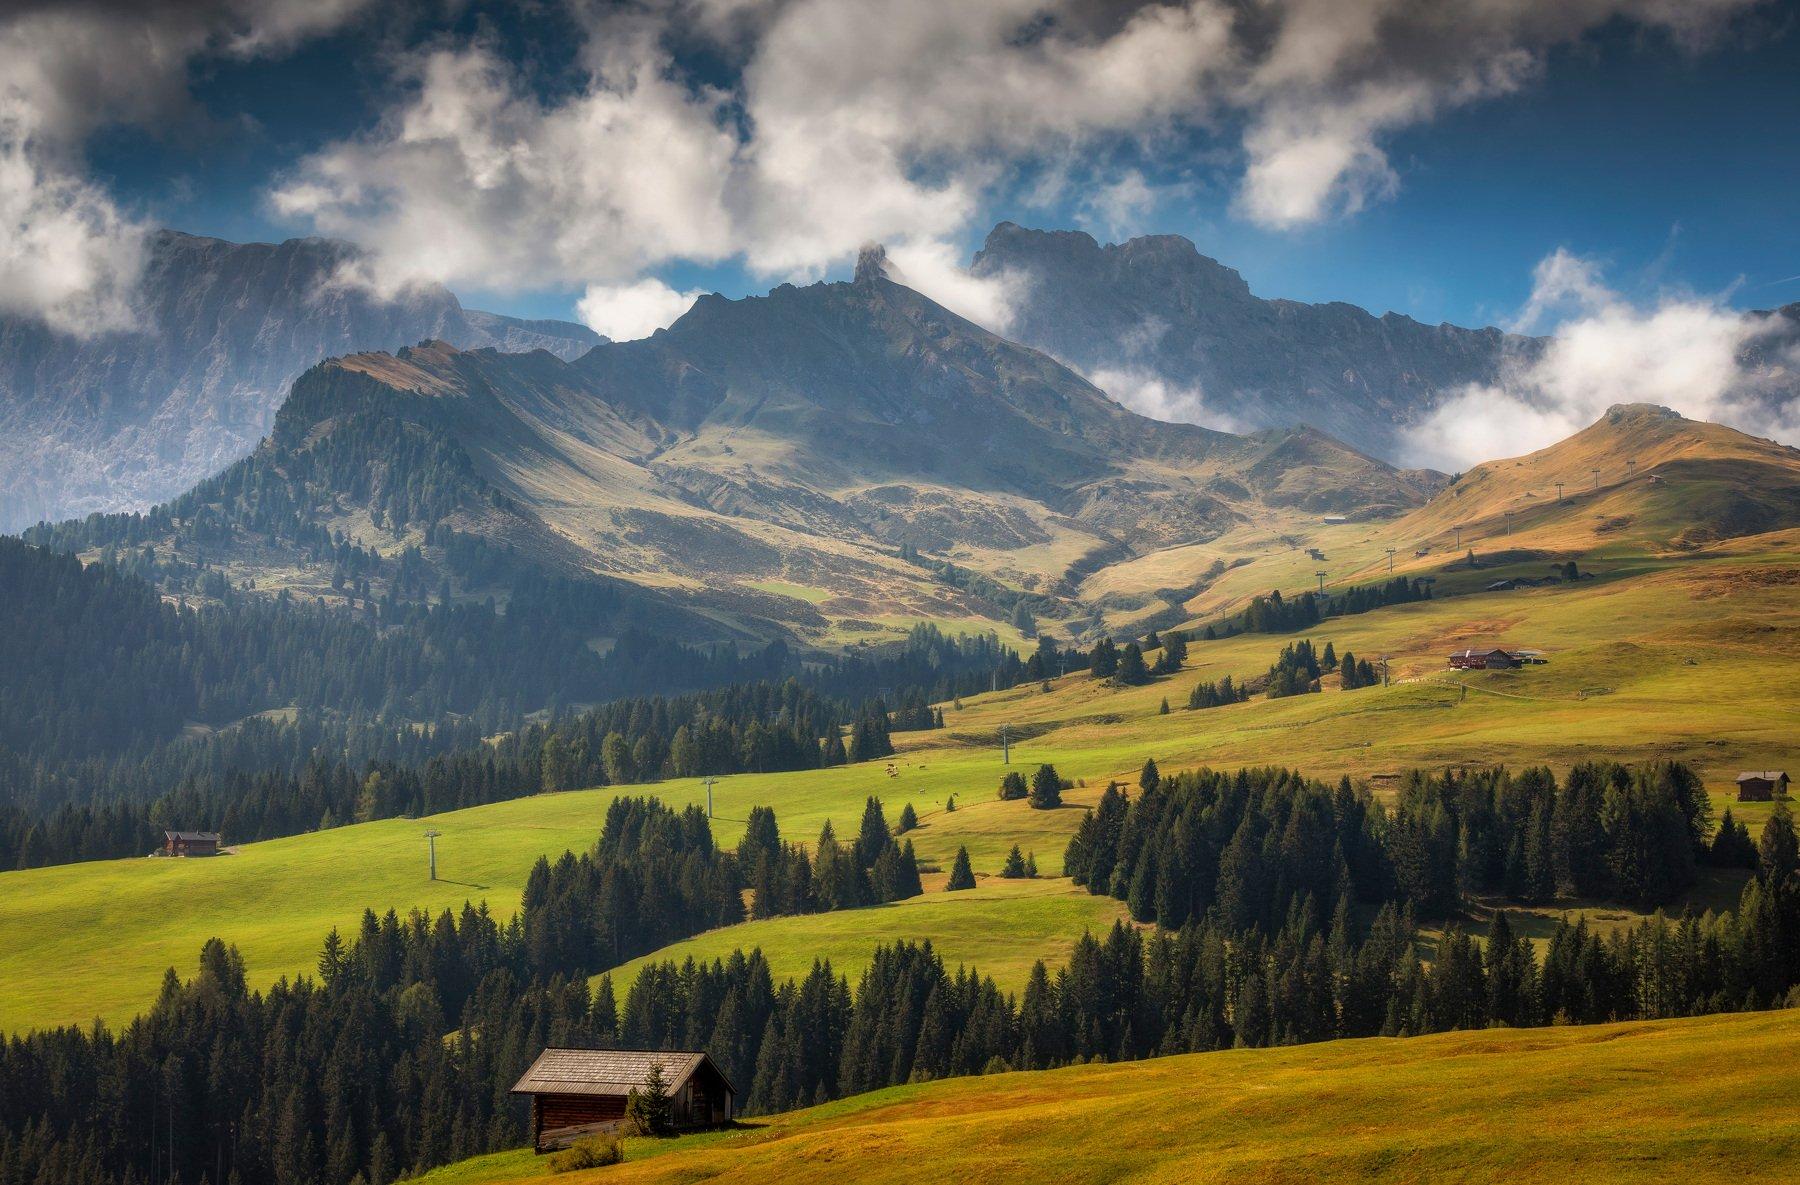 горы, поля, лес, Alexandr Bezmolitvenny